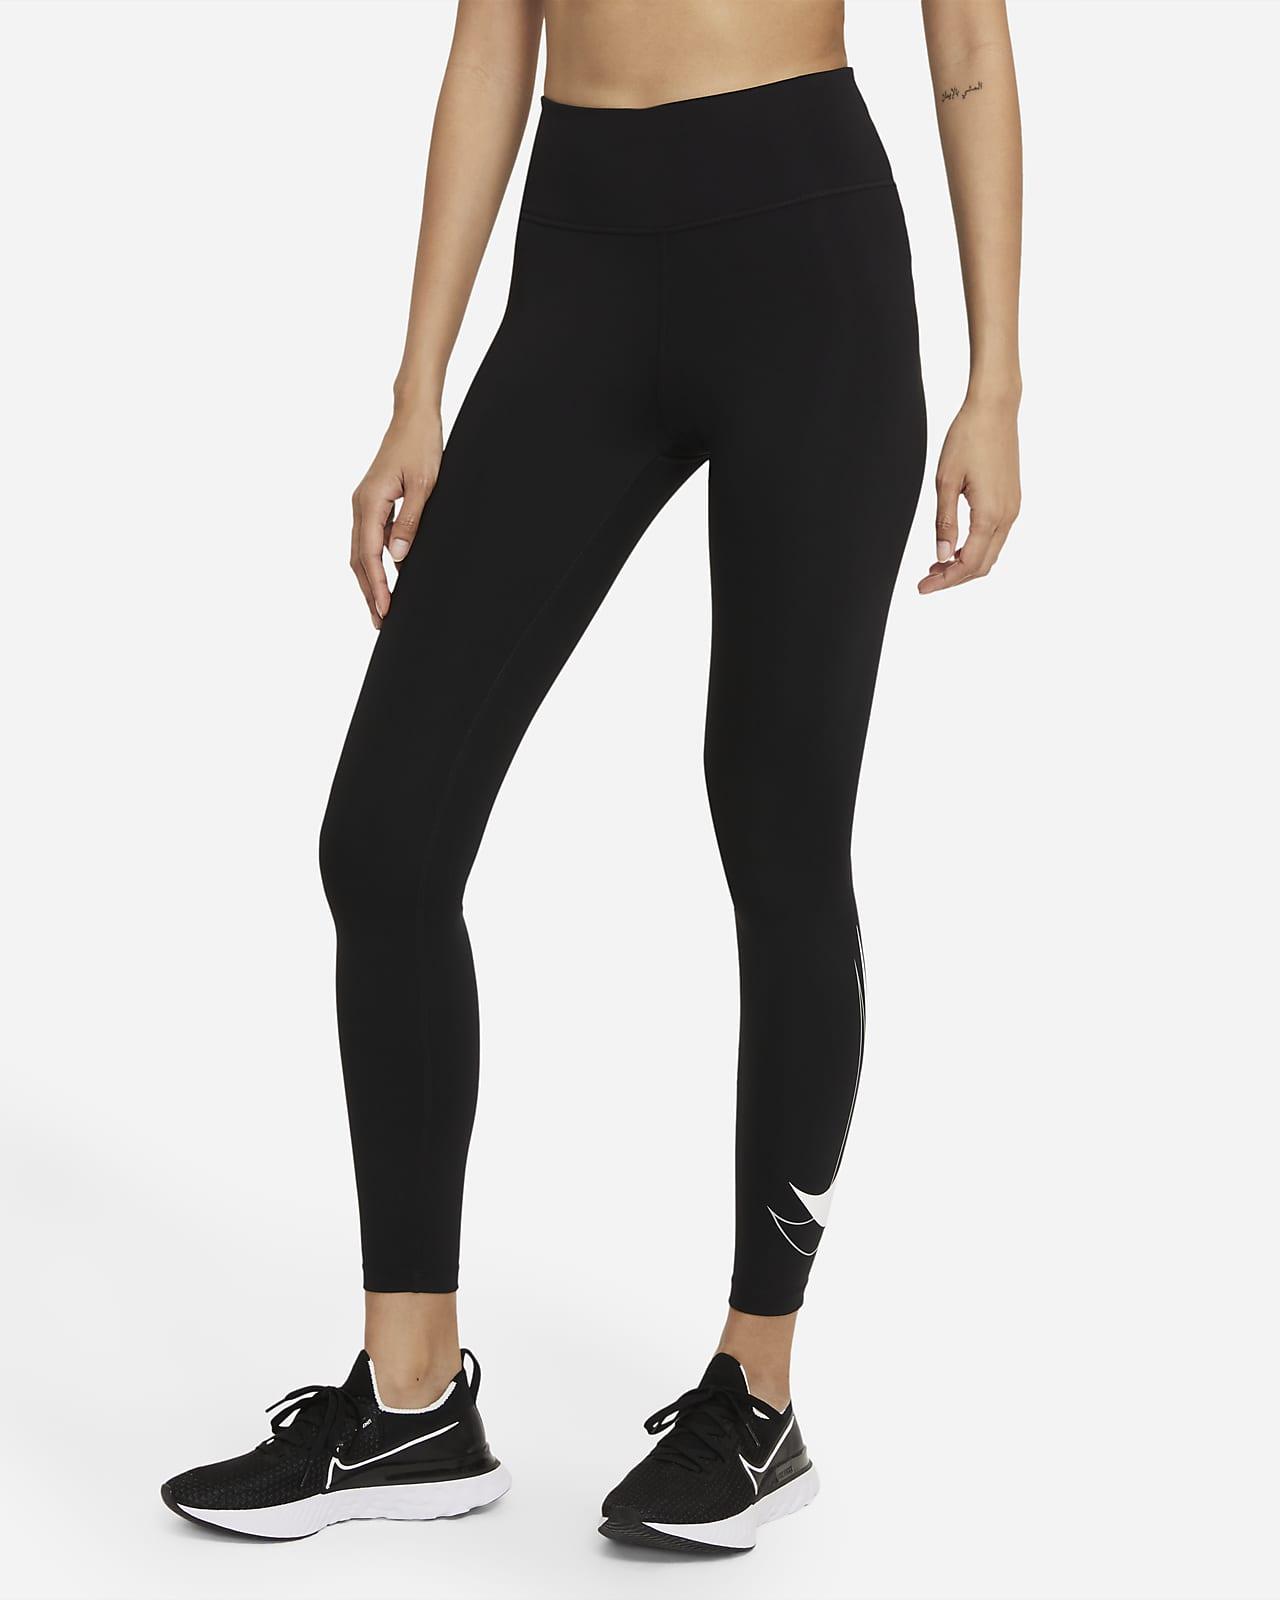 Nike Dri-FIT Swoosh Run Normal Belli 7/8 Kadın Koşu Taytı